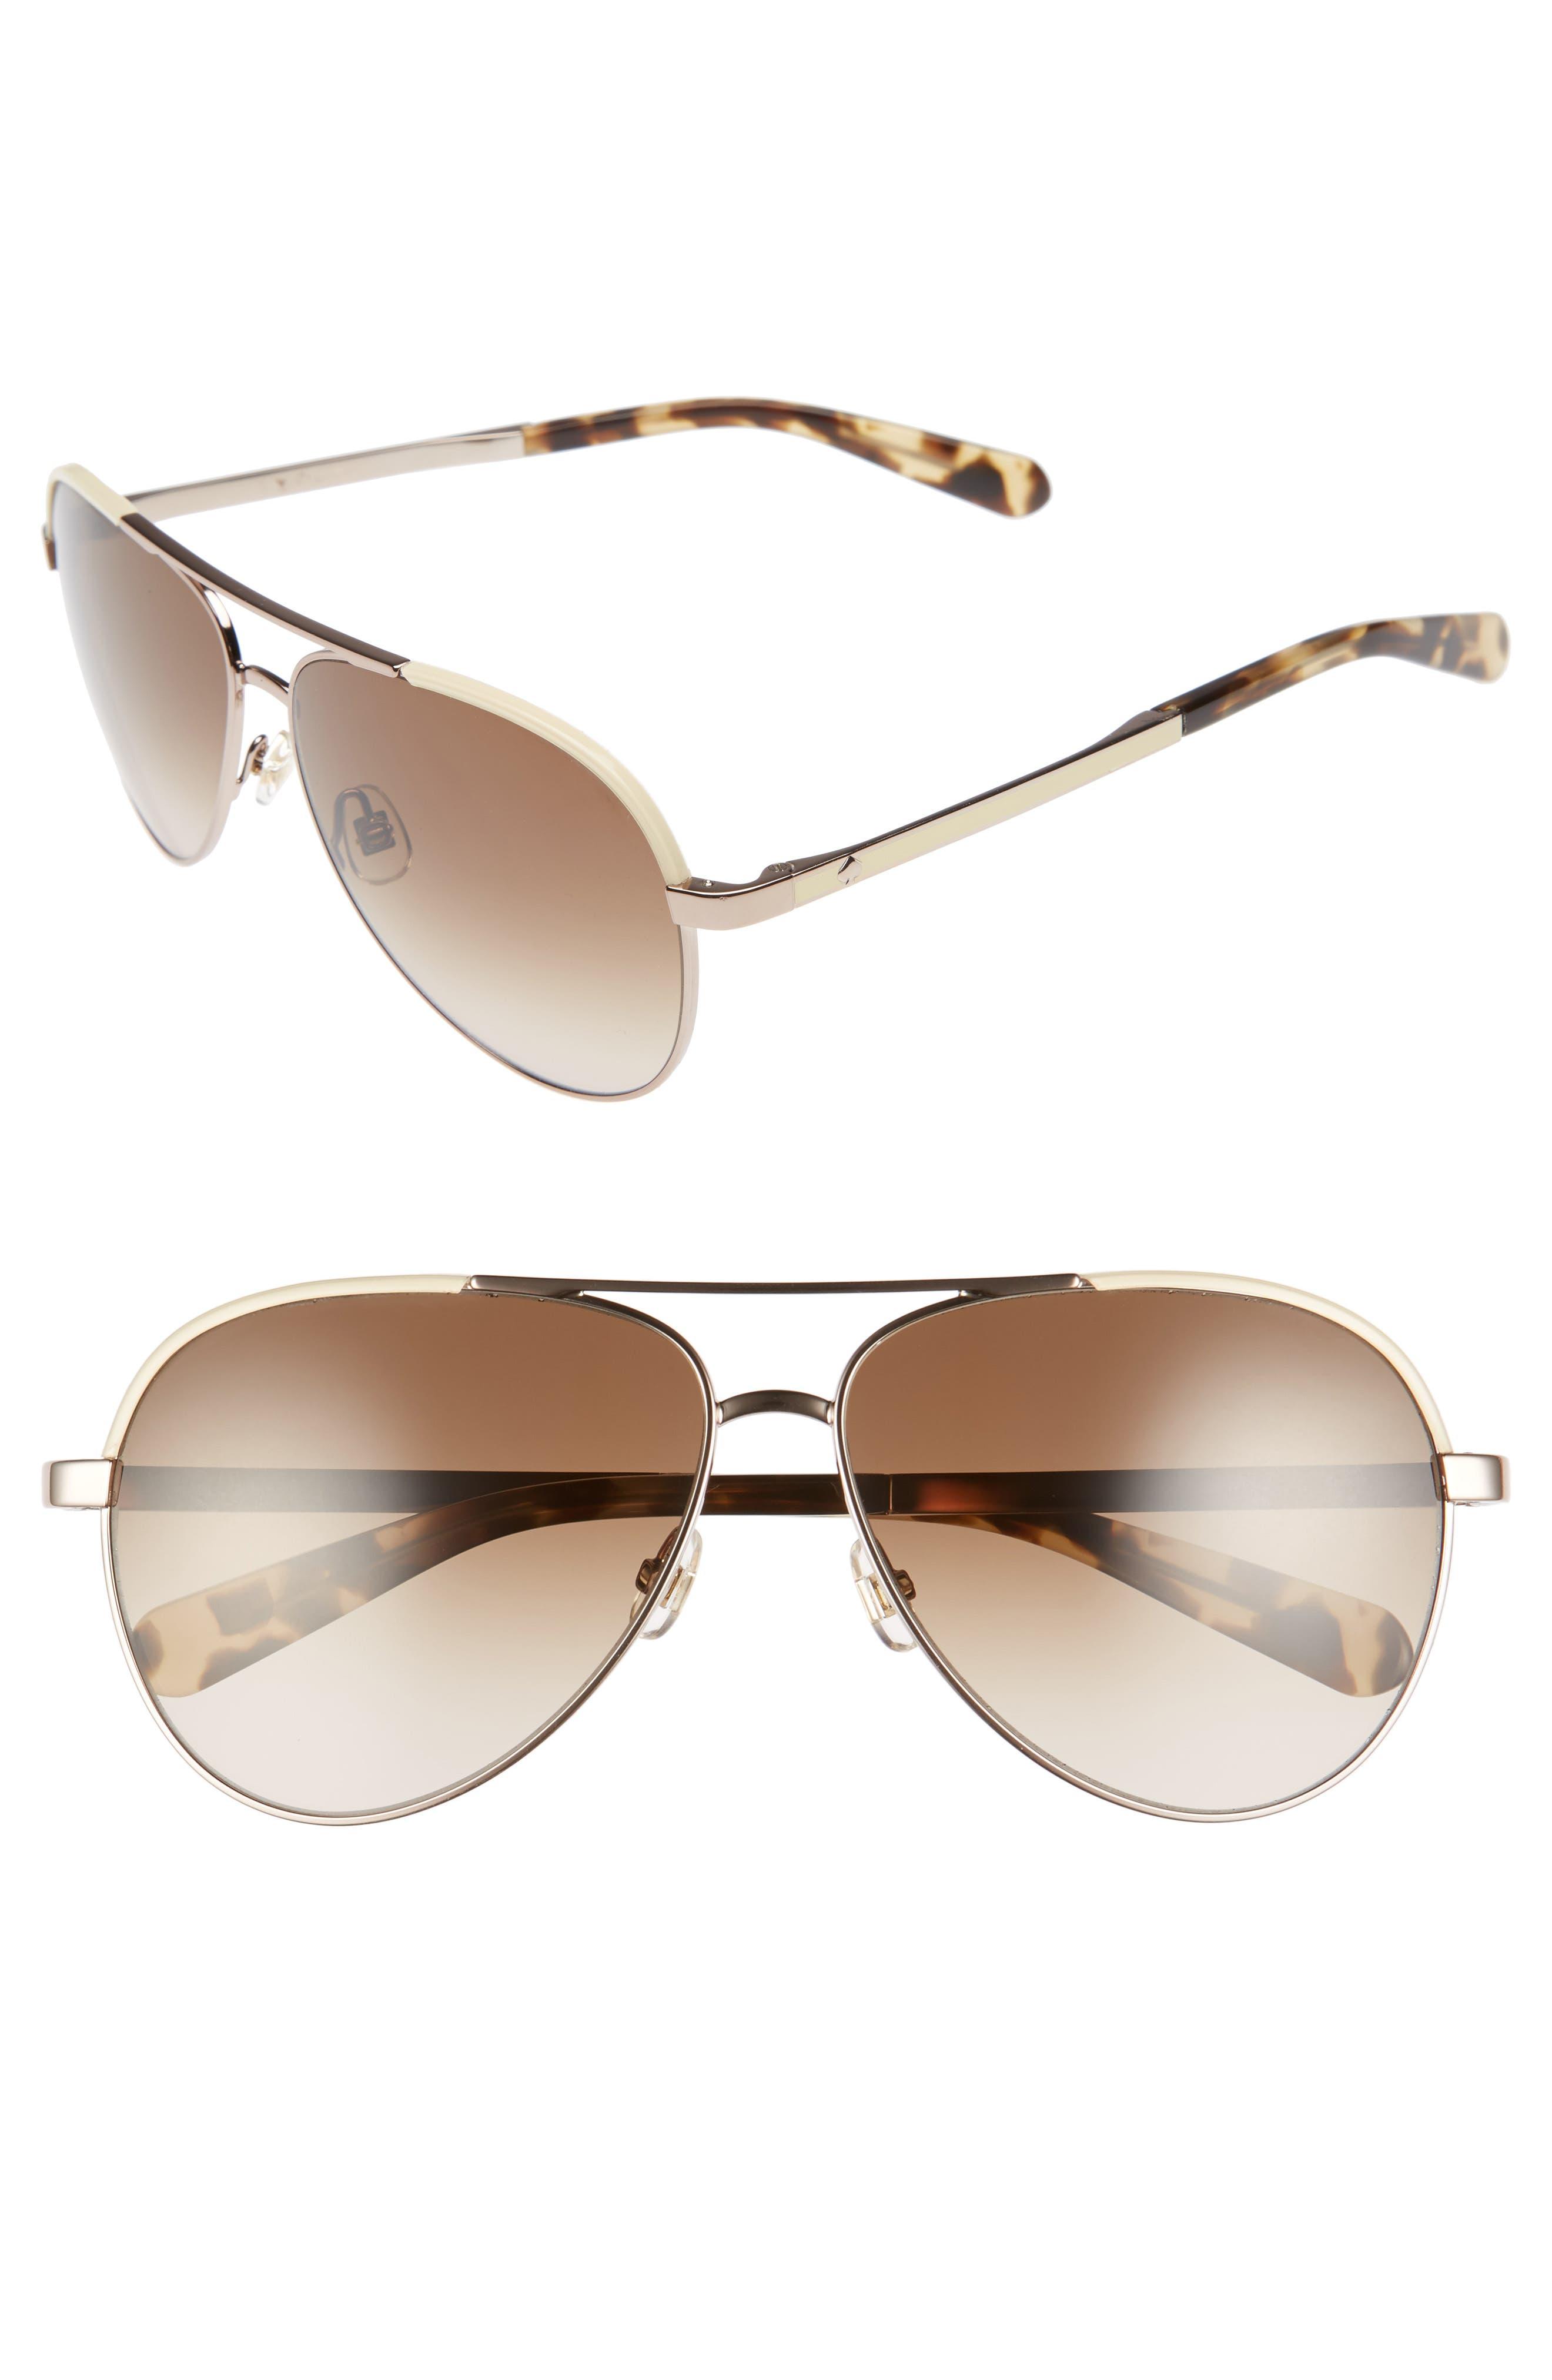 Main Image - kate spade new york amarissa 59mm polarized aviator sunglasses